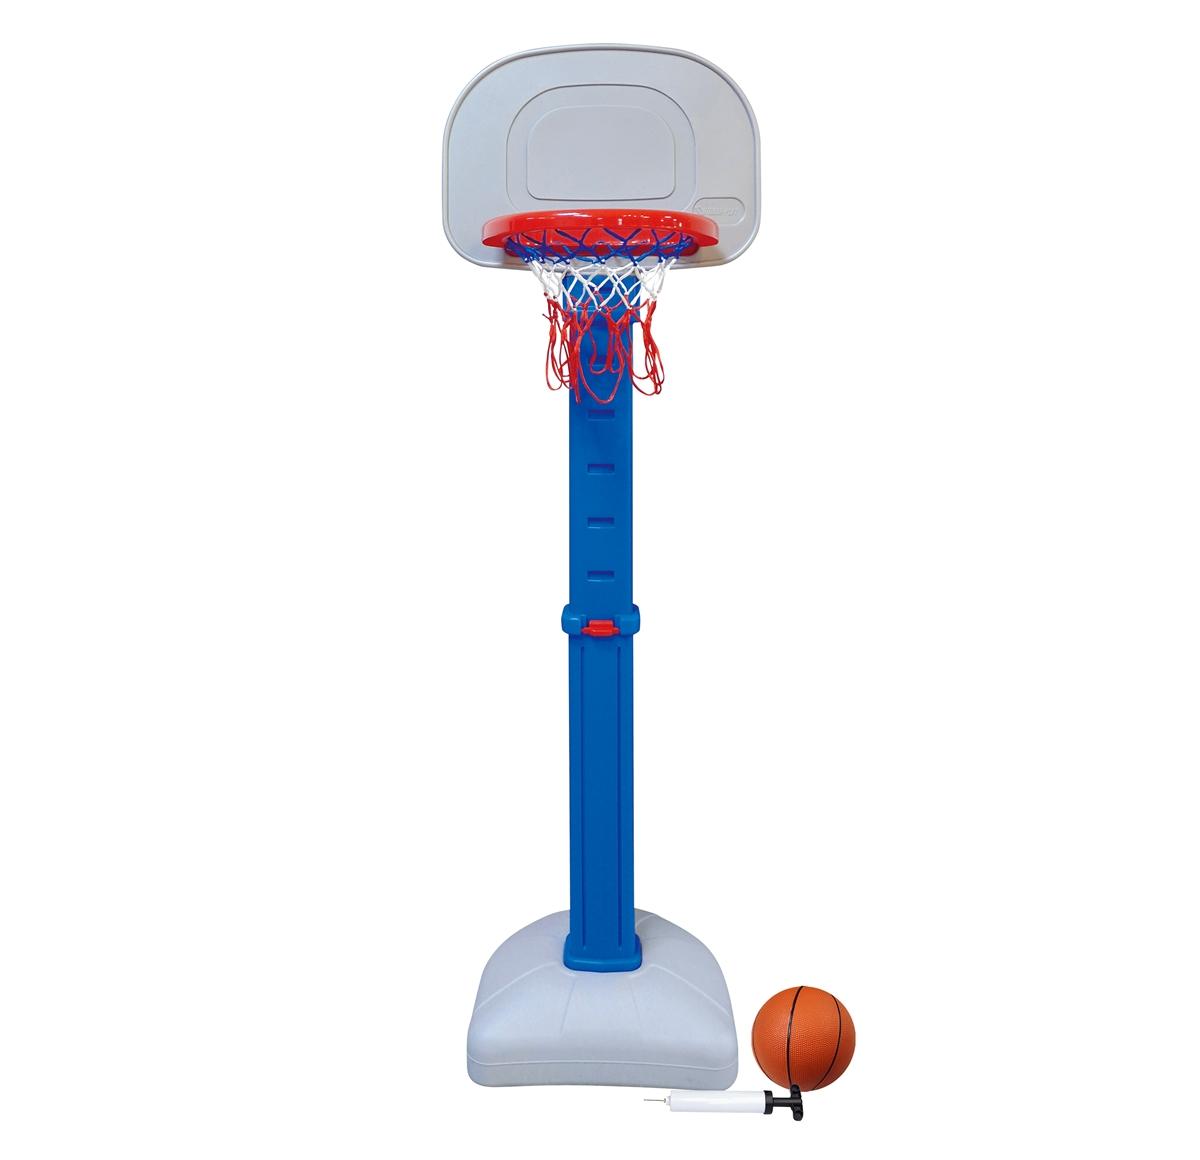 My Hood - Basketball Stand - Start (304016)